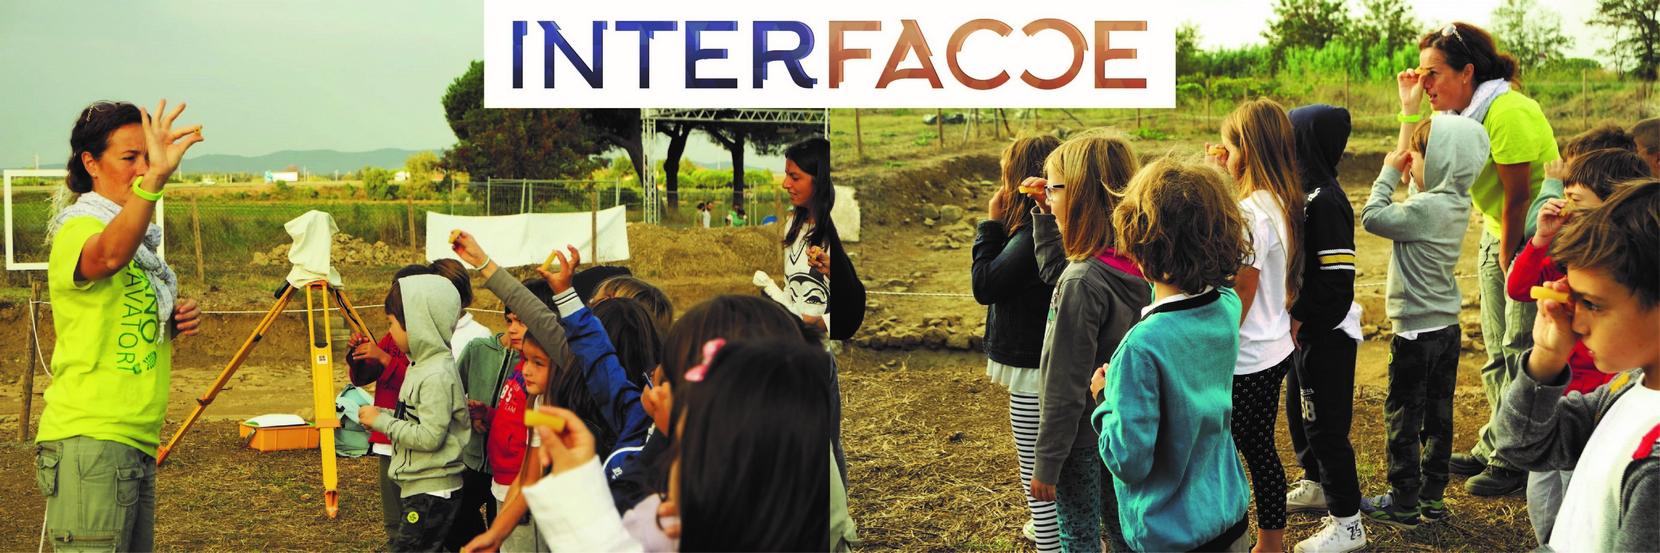 interfacce bambini